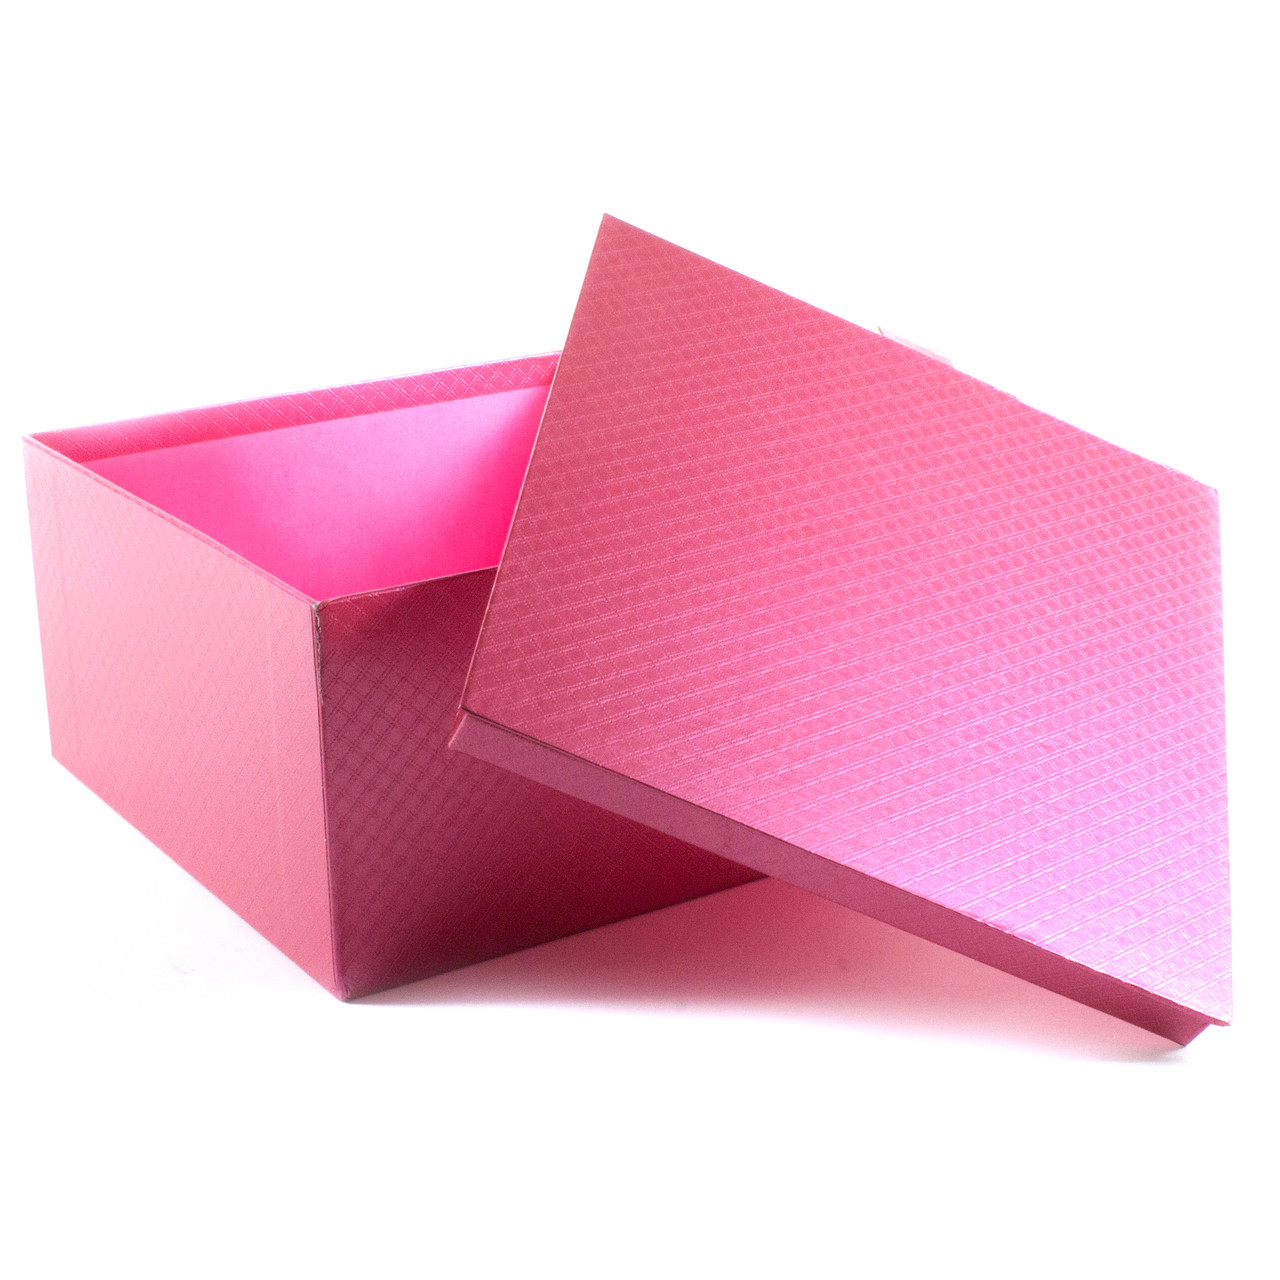 Подарочная коробка Розовый Металлик 22 x 22 x 12 см